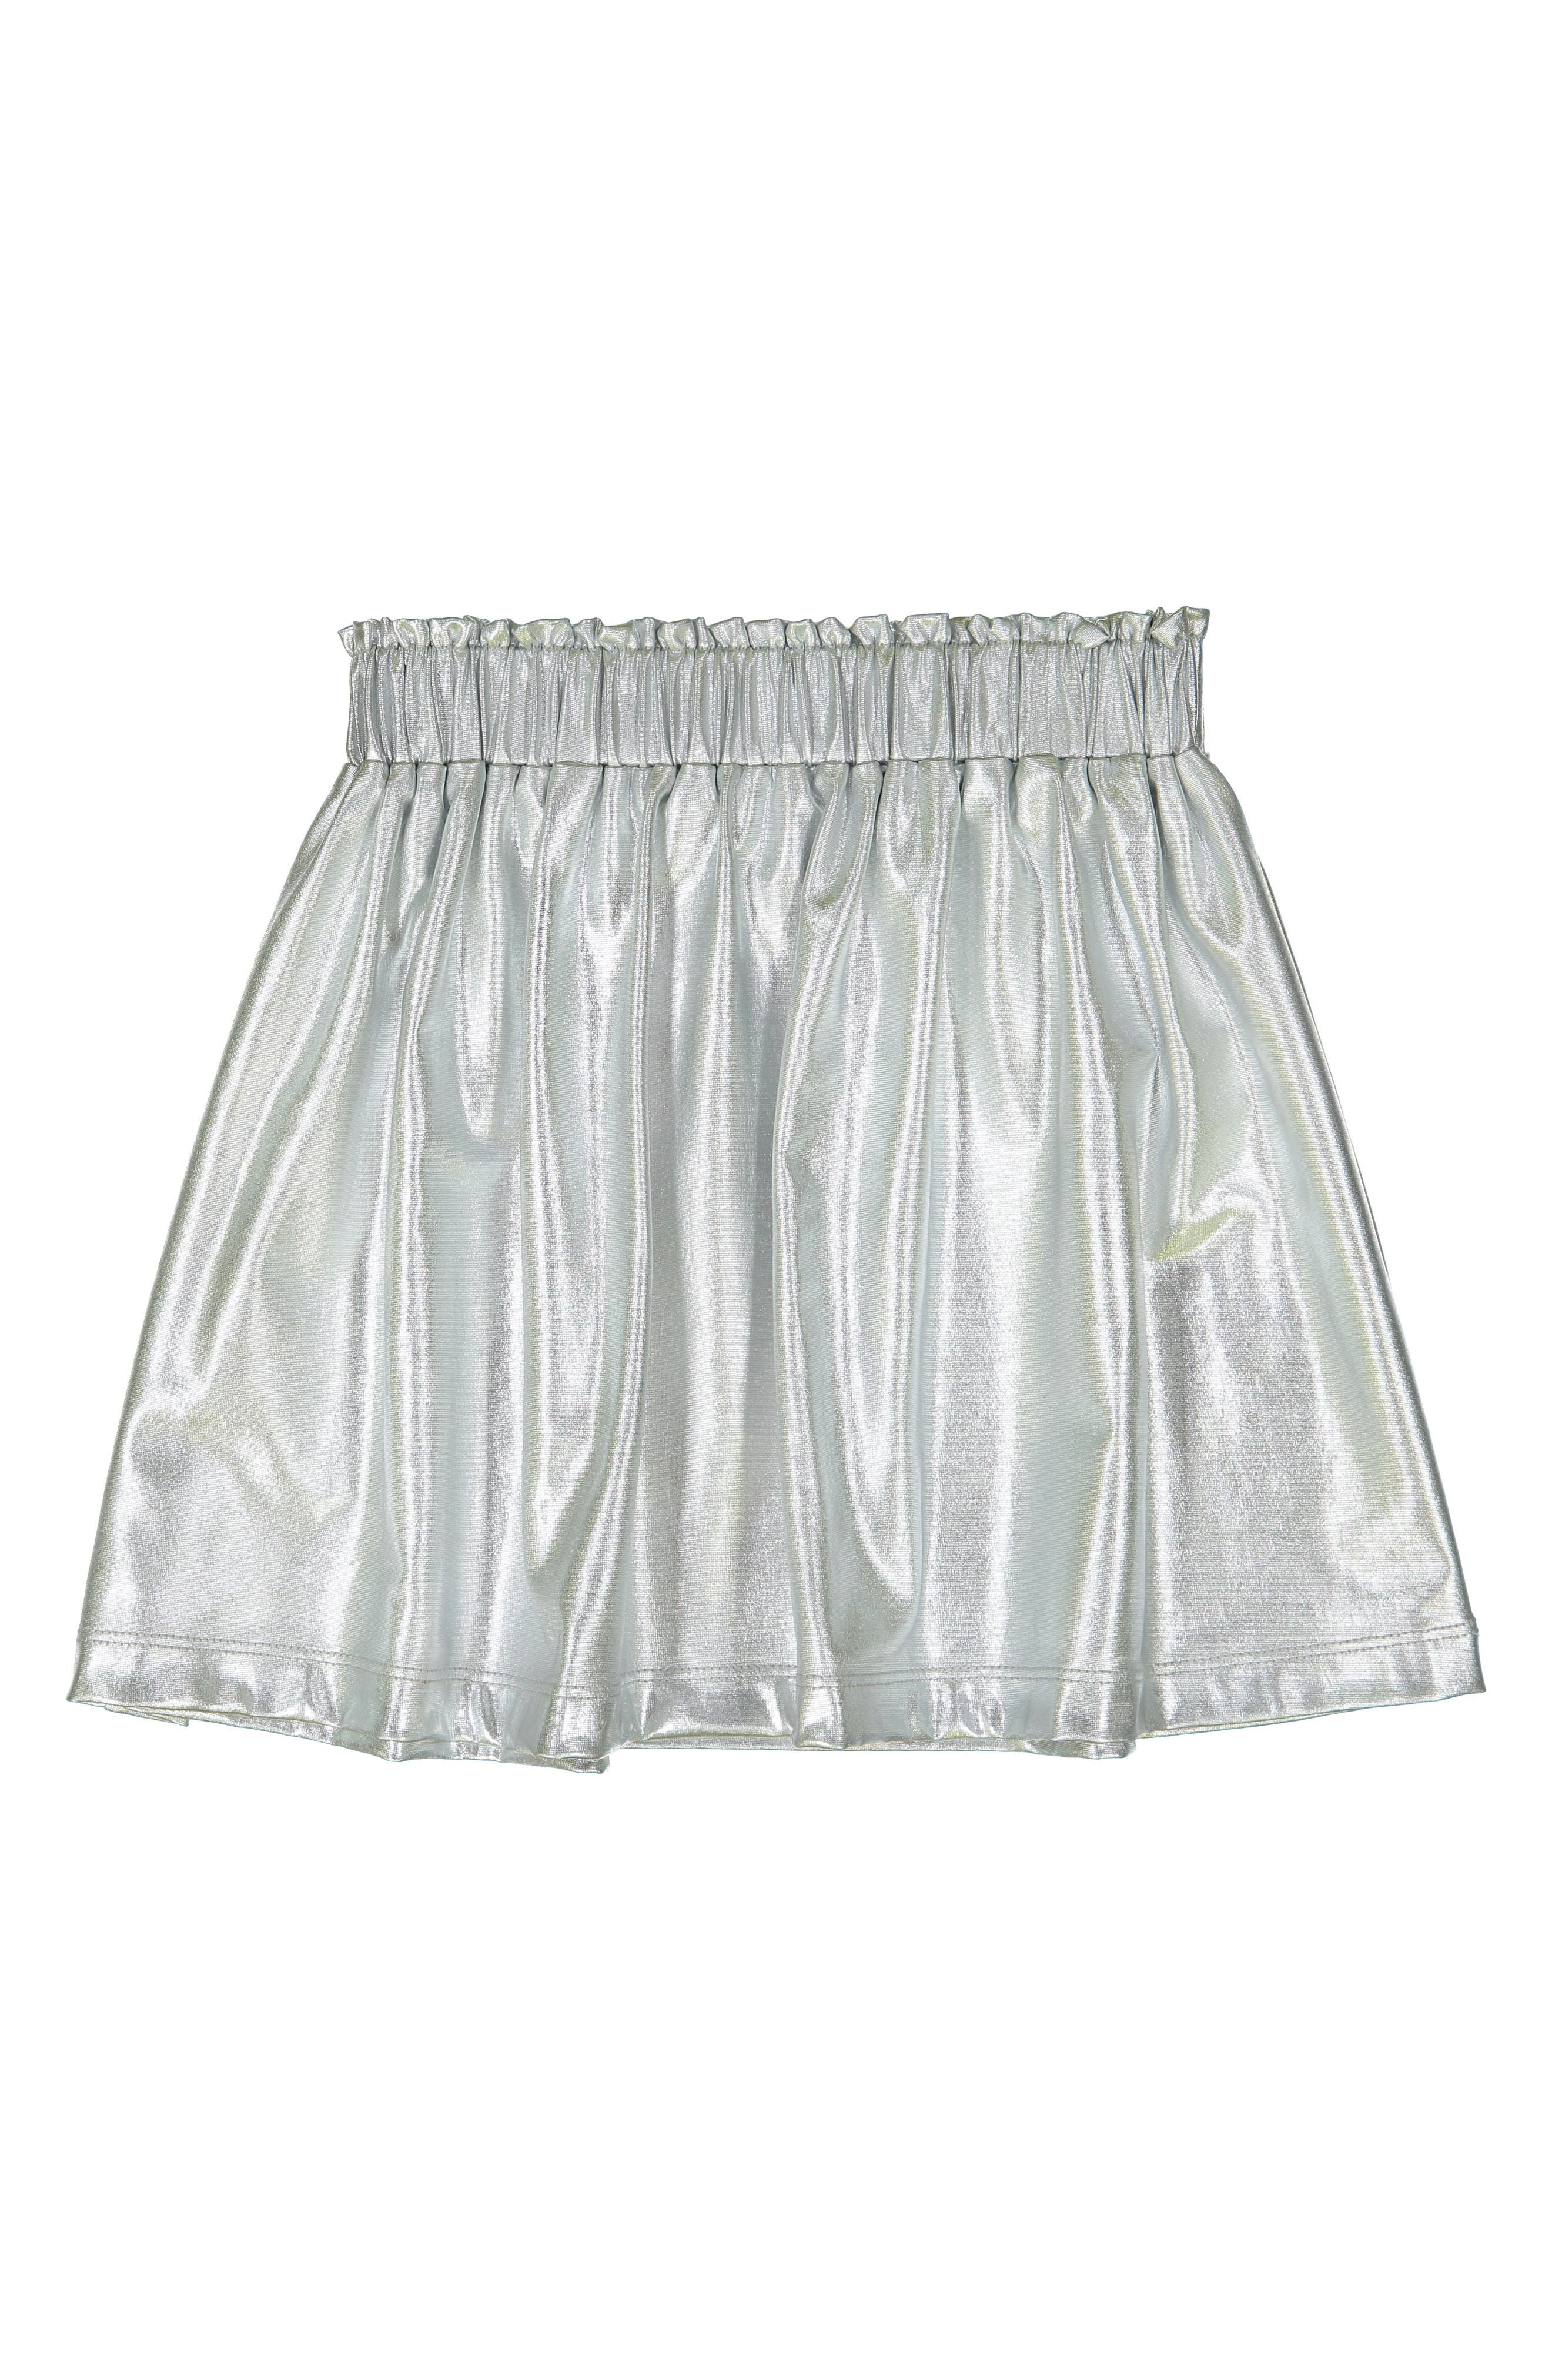 Silver Metallic Skirt,                         Main,                         color, SILVER